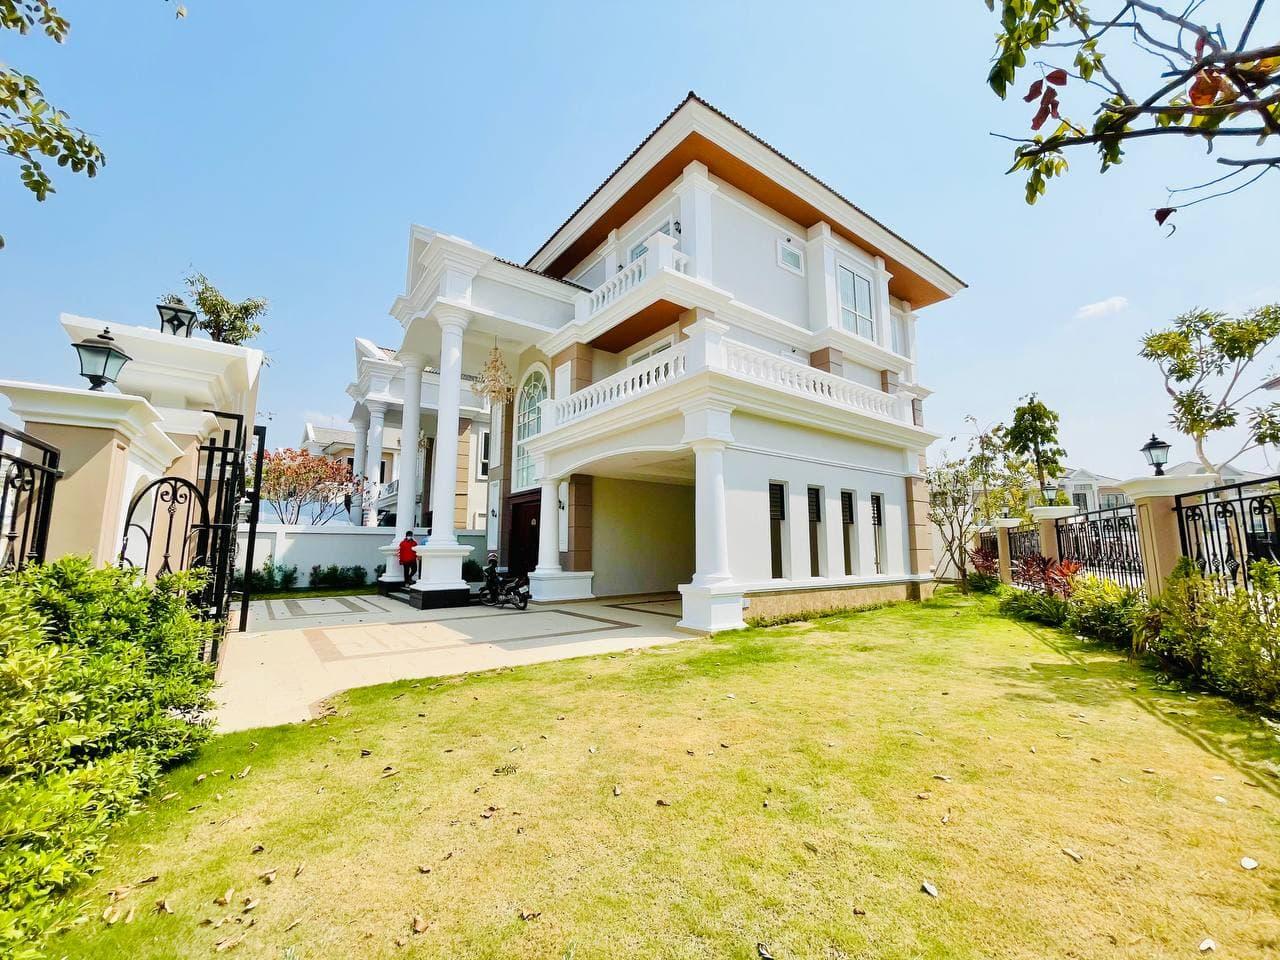 Prince Villa for Sale in Borey Peng Huot Boeng Snor